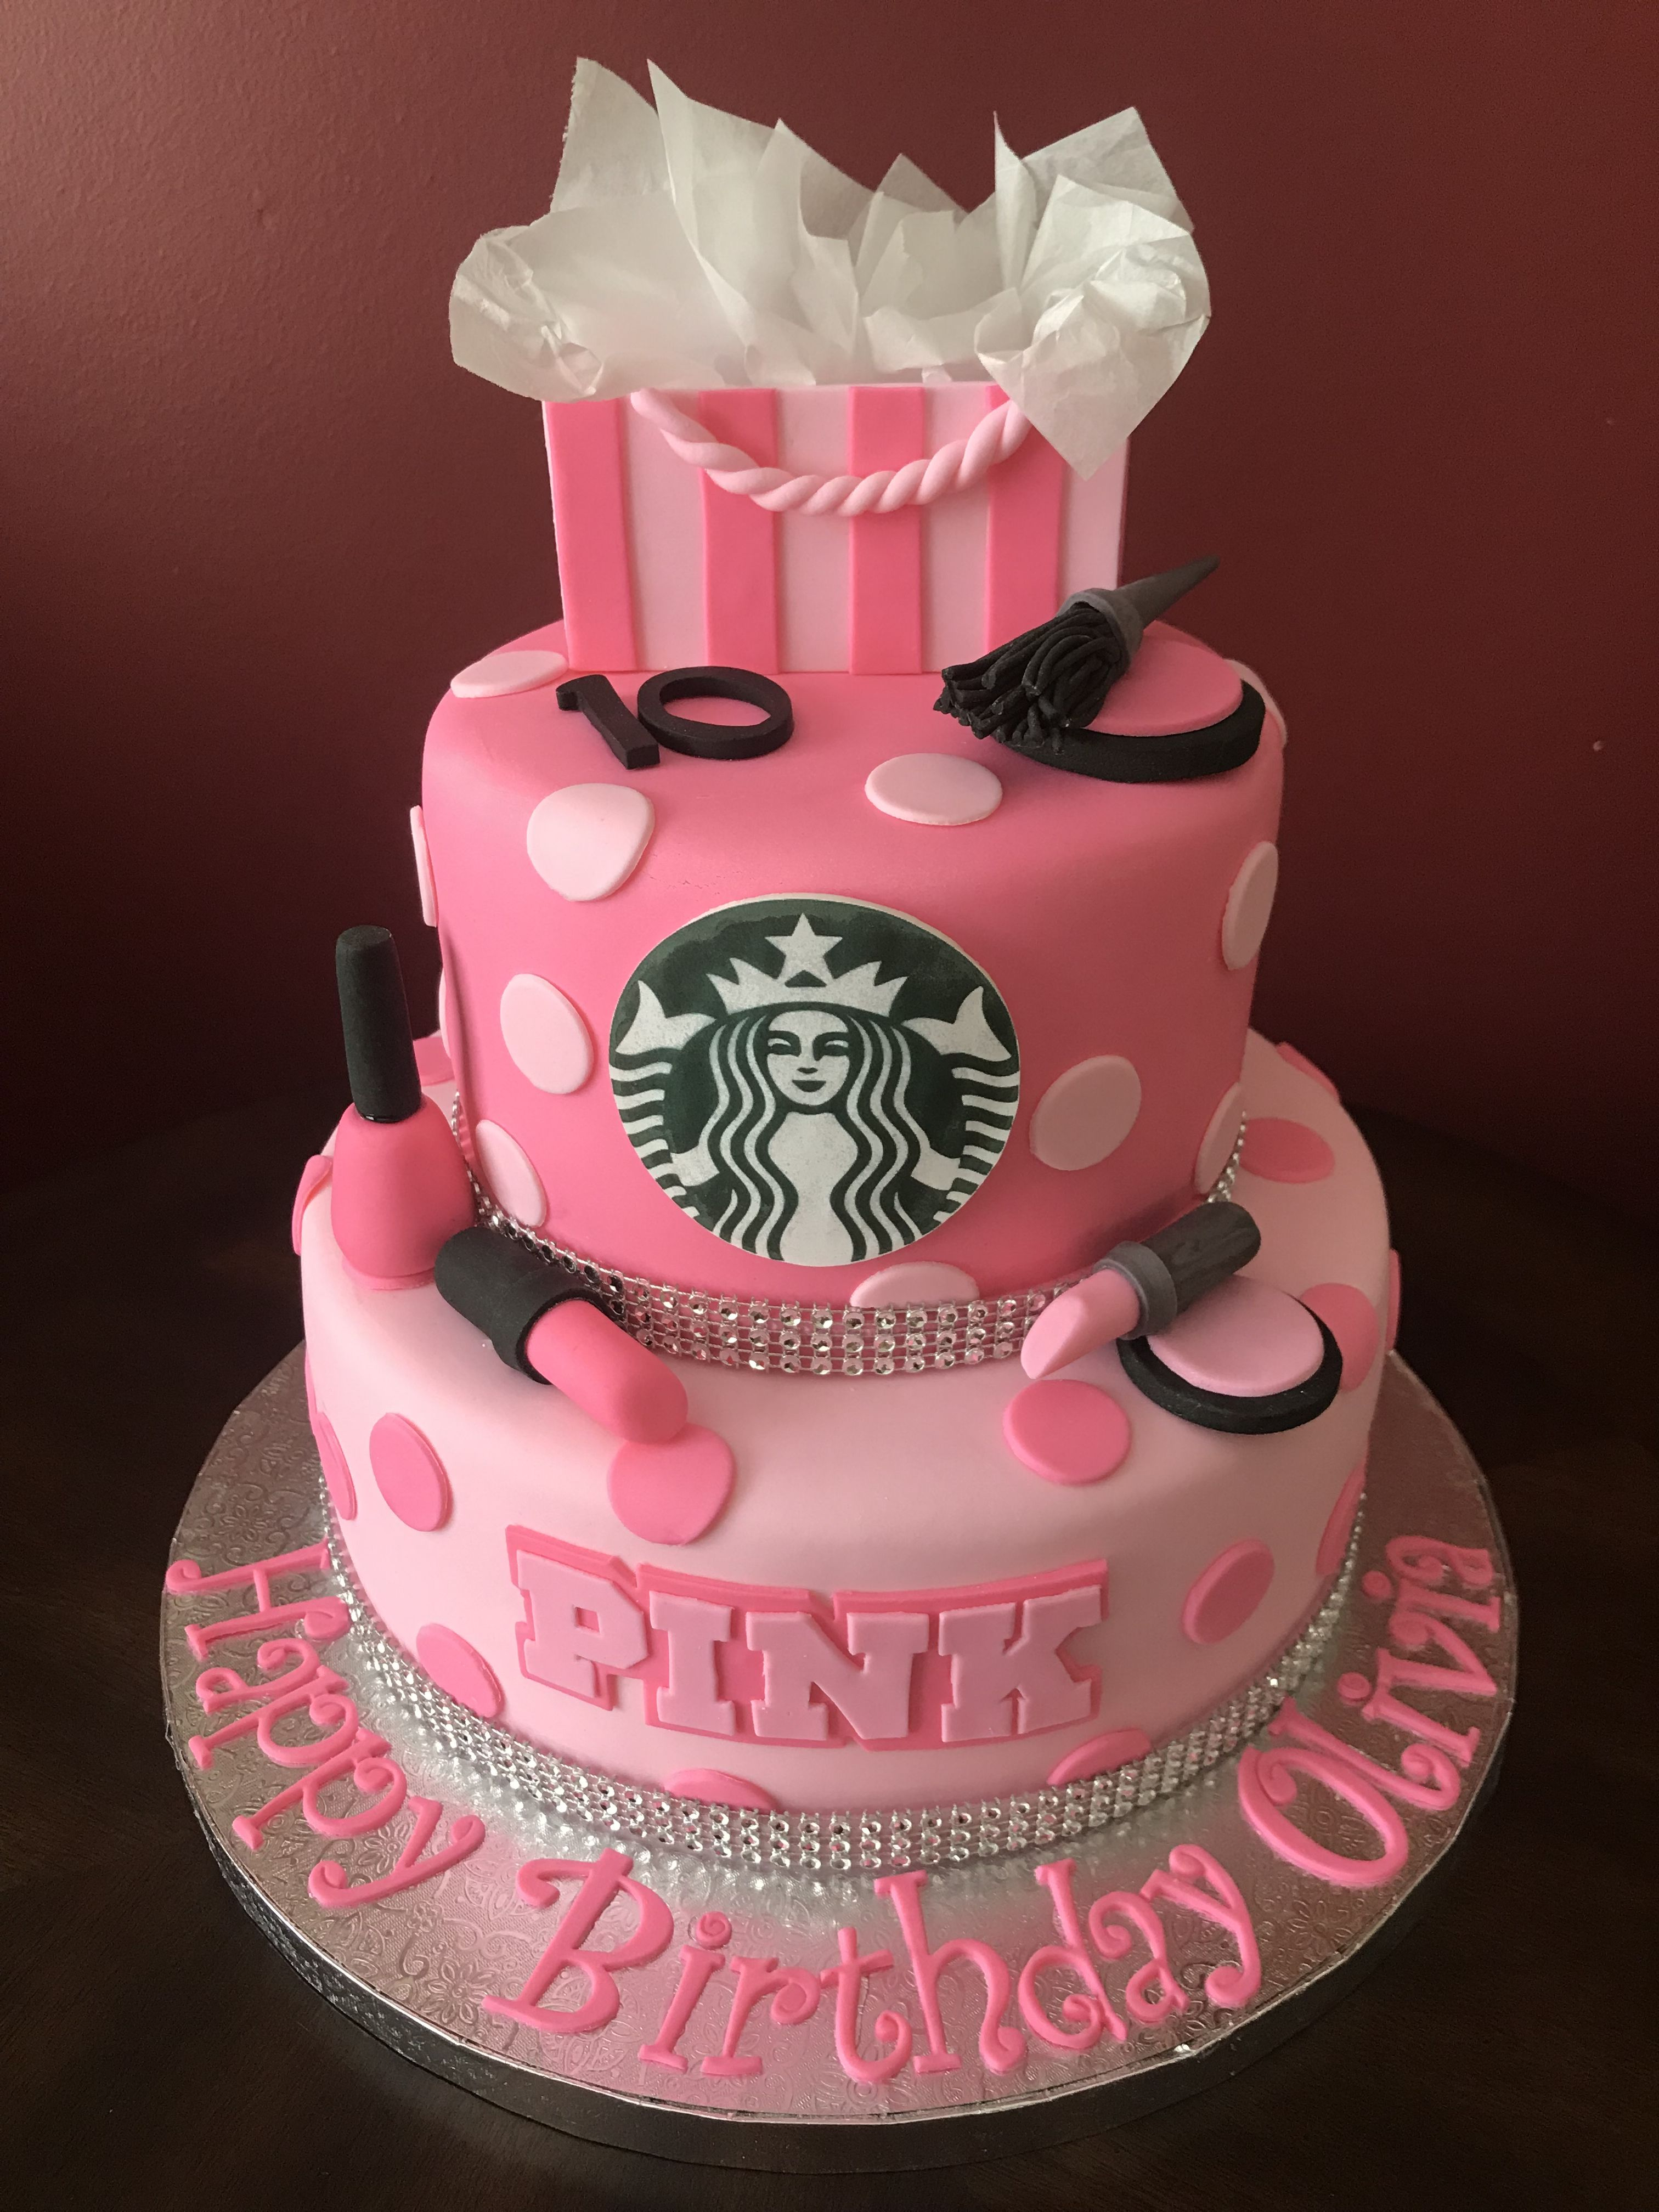 Victoria S Secret Pink Starbucks Makeup Birthday Cake 14th Birthday Cakes Makeup Birthday Cakes Birthday Cakes For Teens